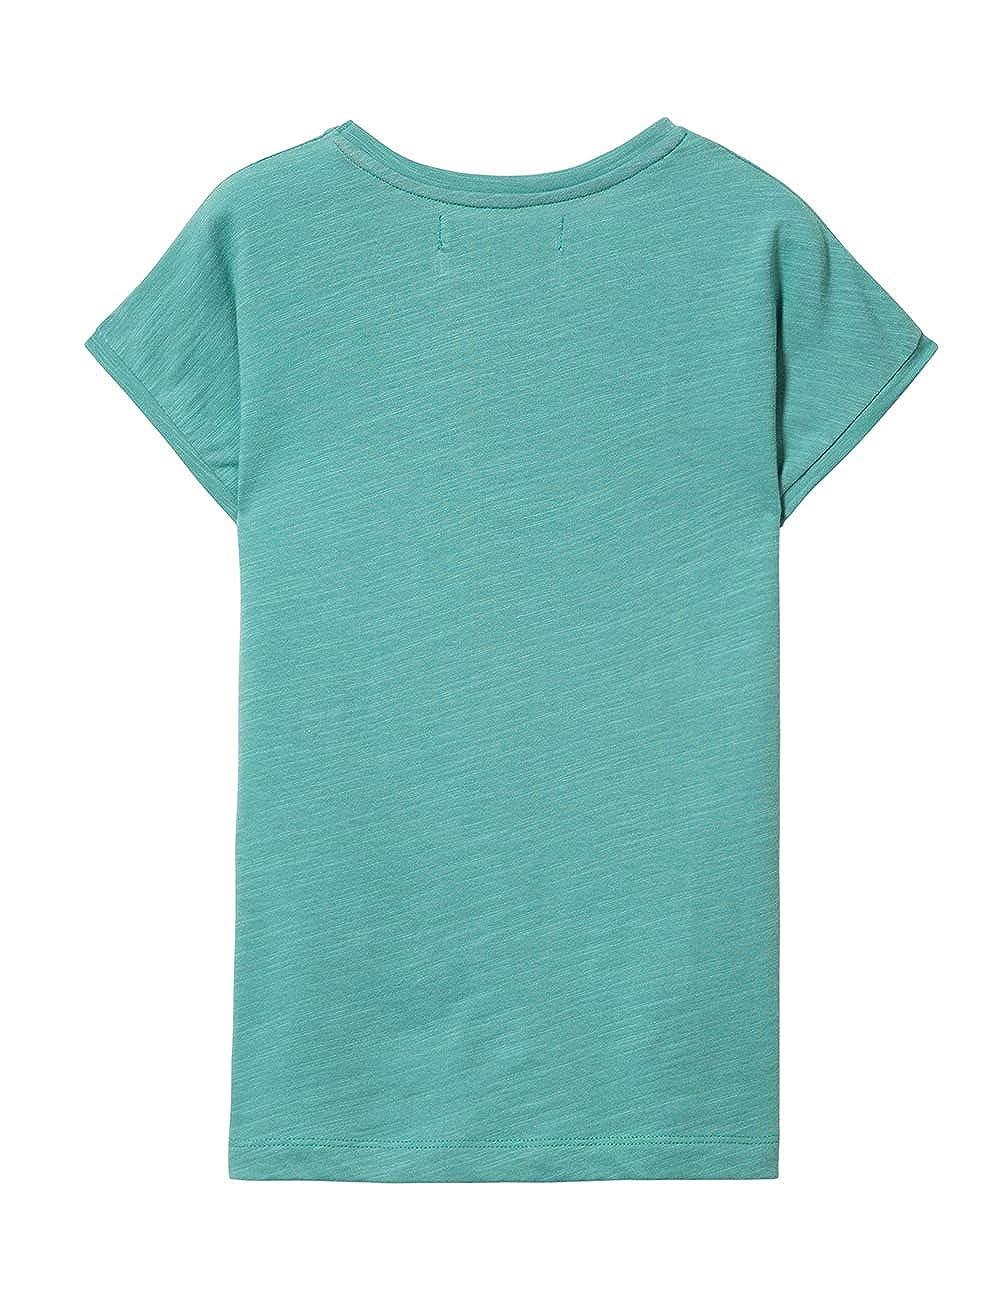 TS/_Missouri Desigual Girl Knit T-Shirt Short Sleeve Fille